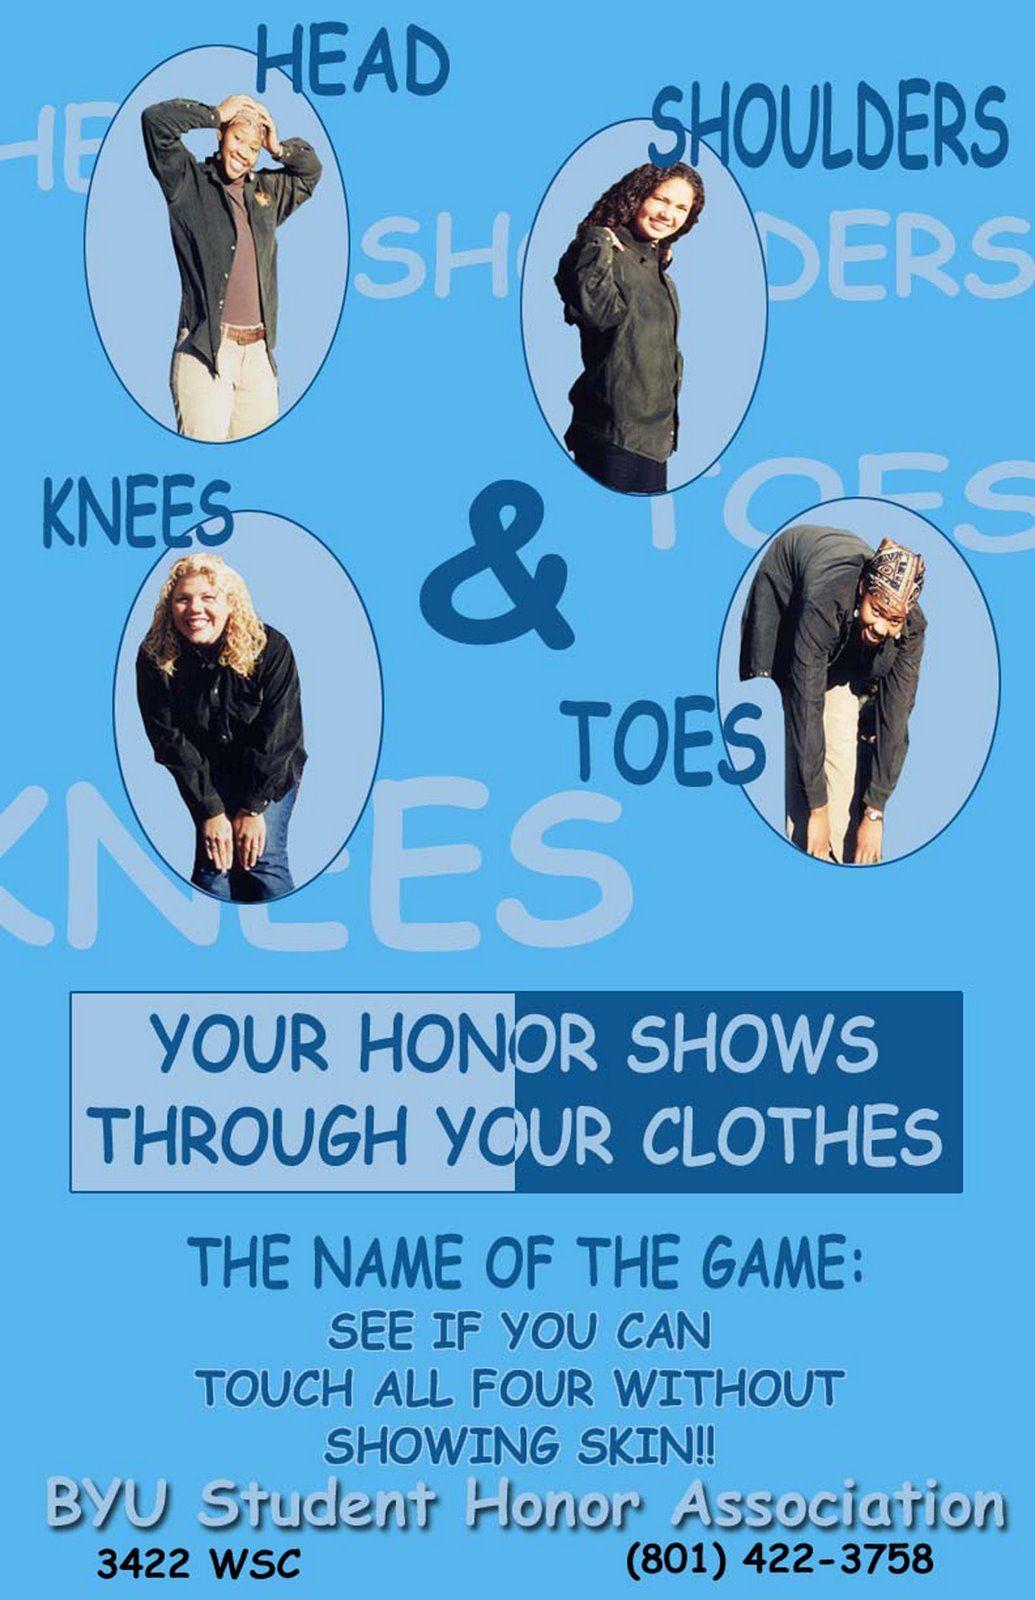 Byu Dress Code Sociological Images Byu Dress Codes Mormon Dress